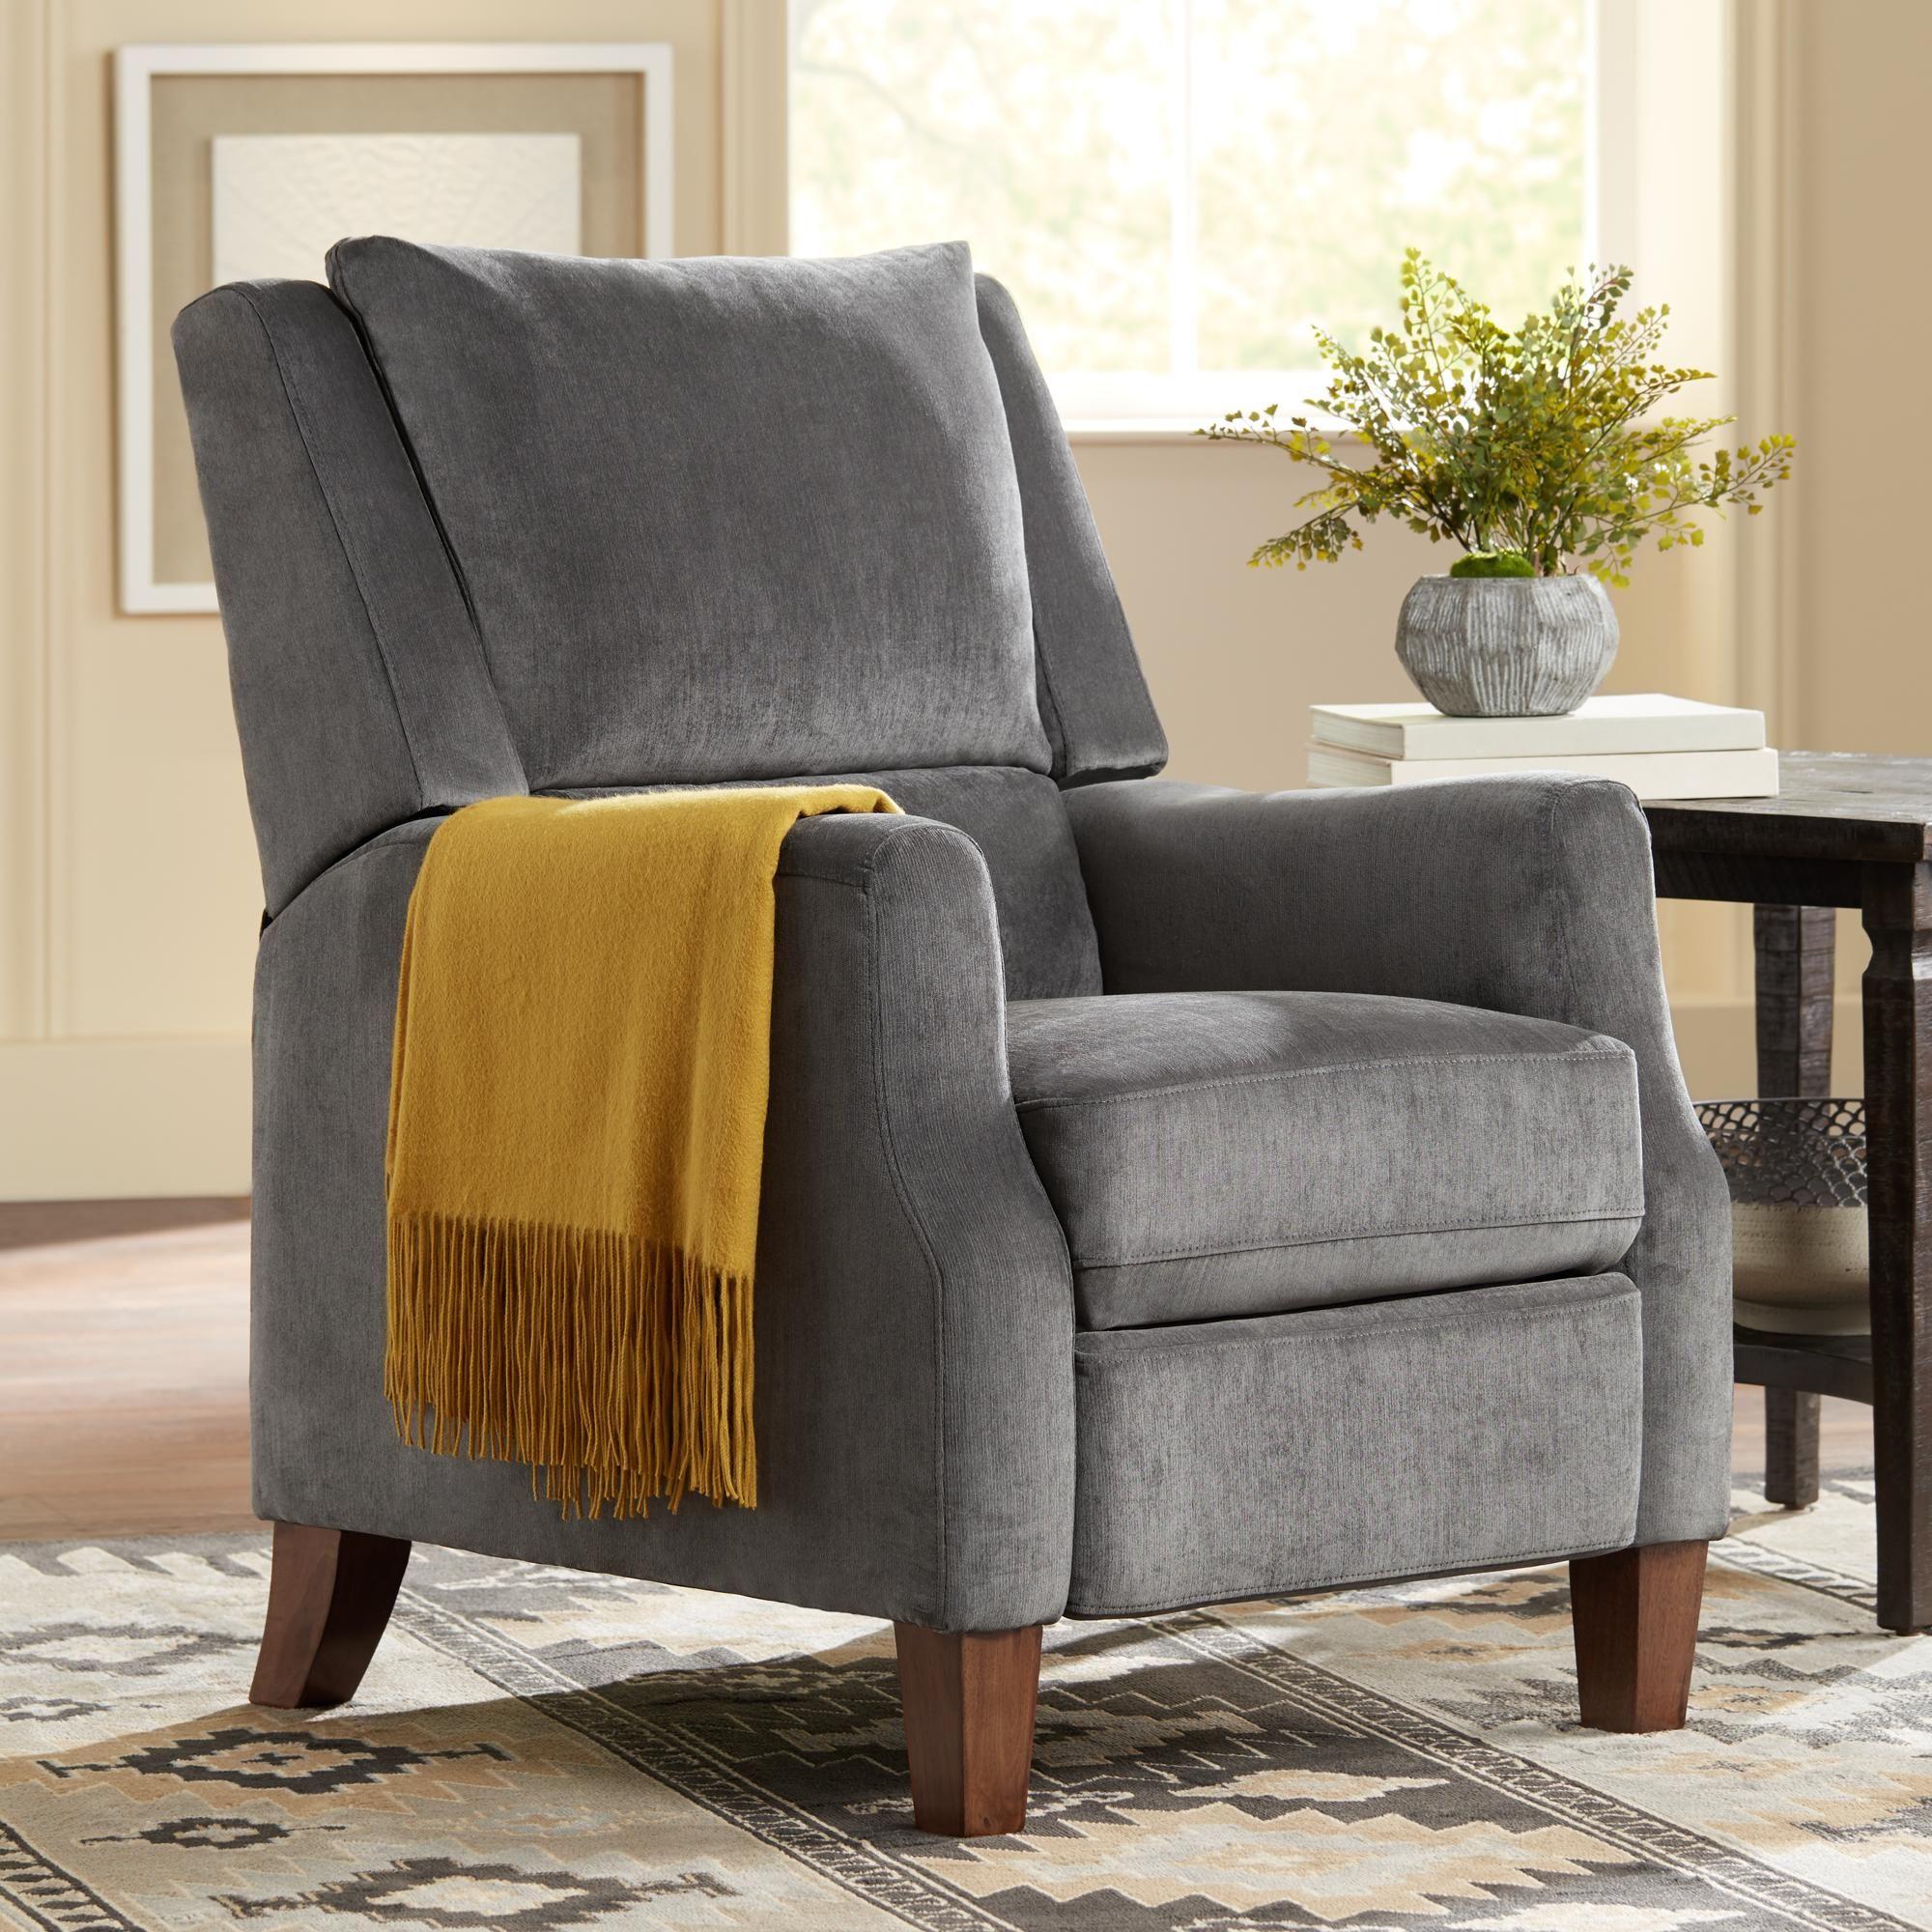 Seating Irina Gray Velvet Recliner Chair Living Room Recliner Velvet Chairs Living Room Stylish Recliners